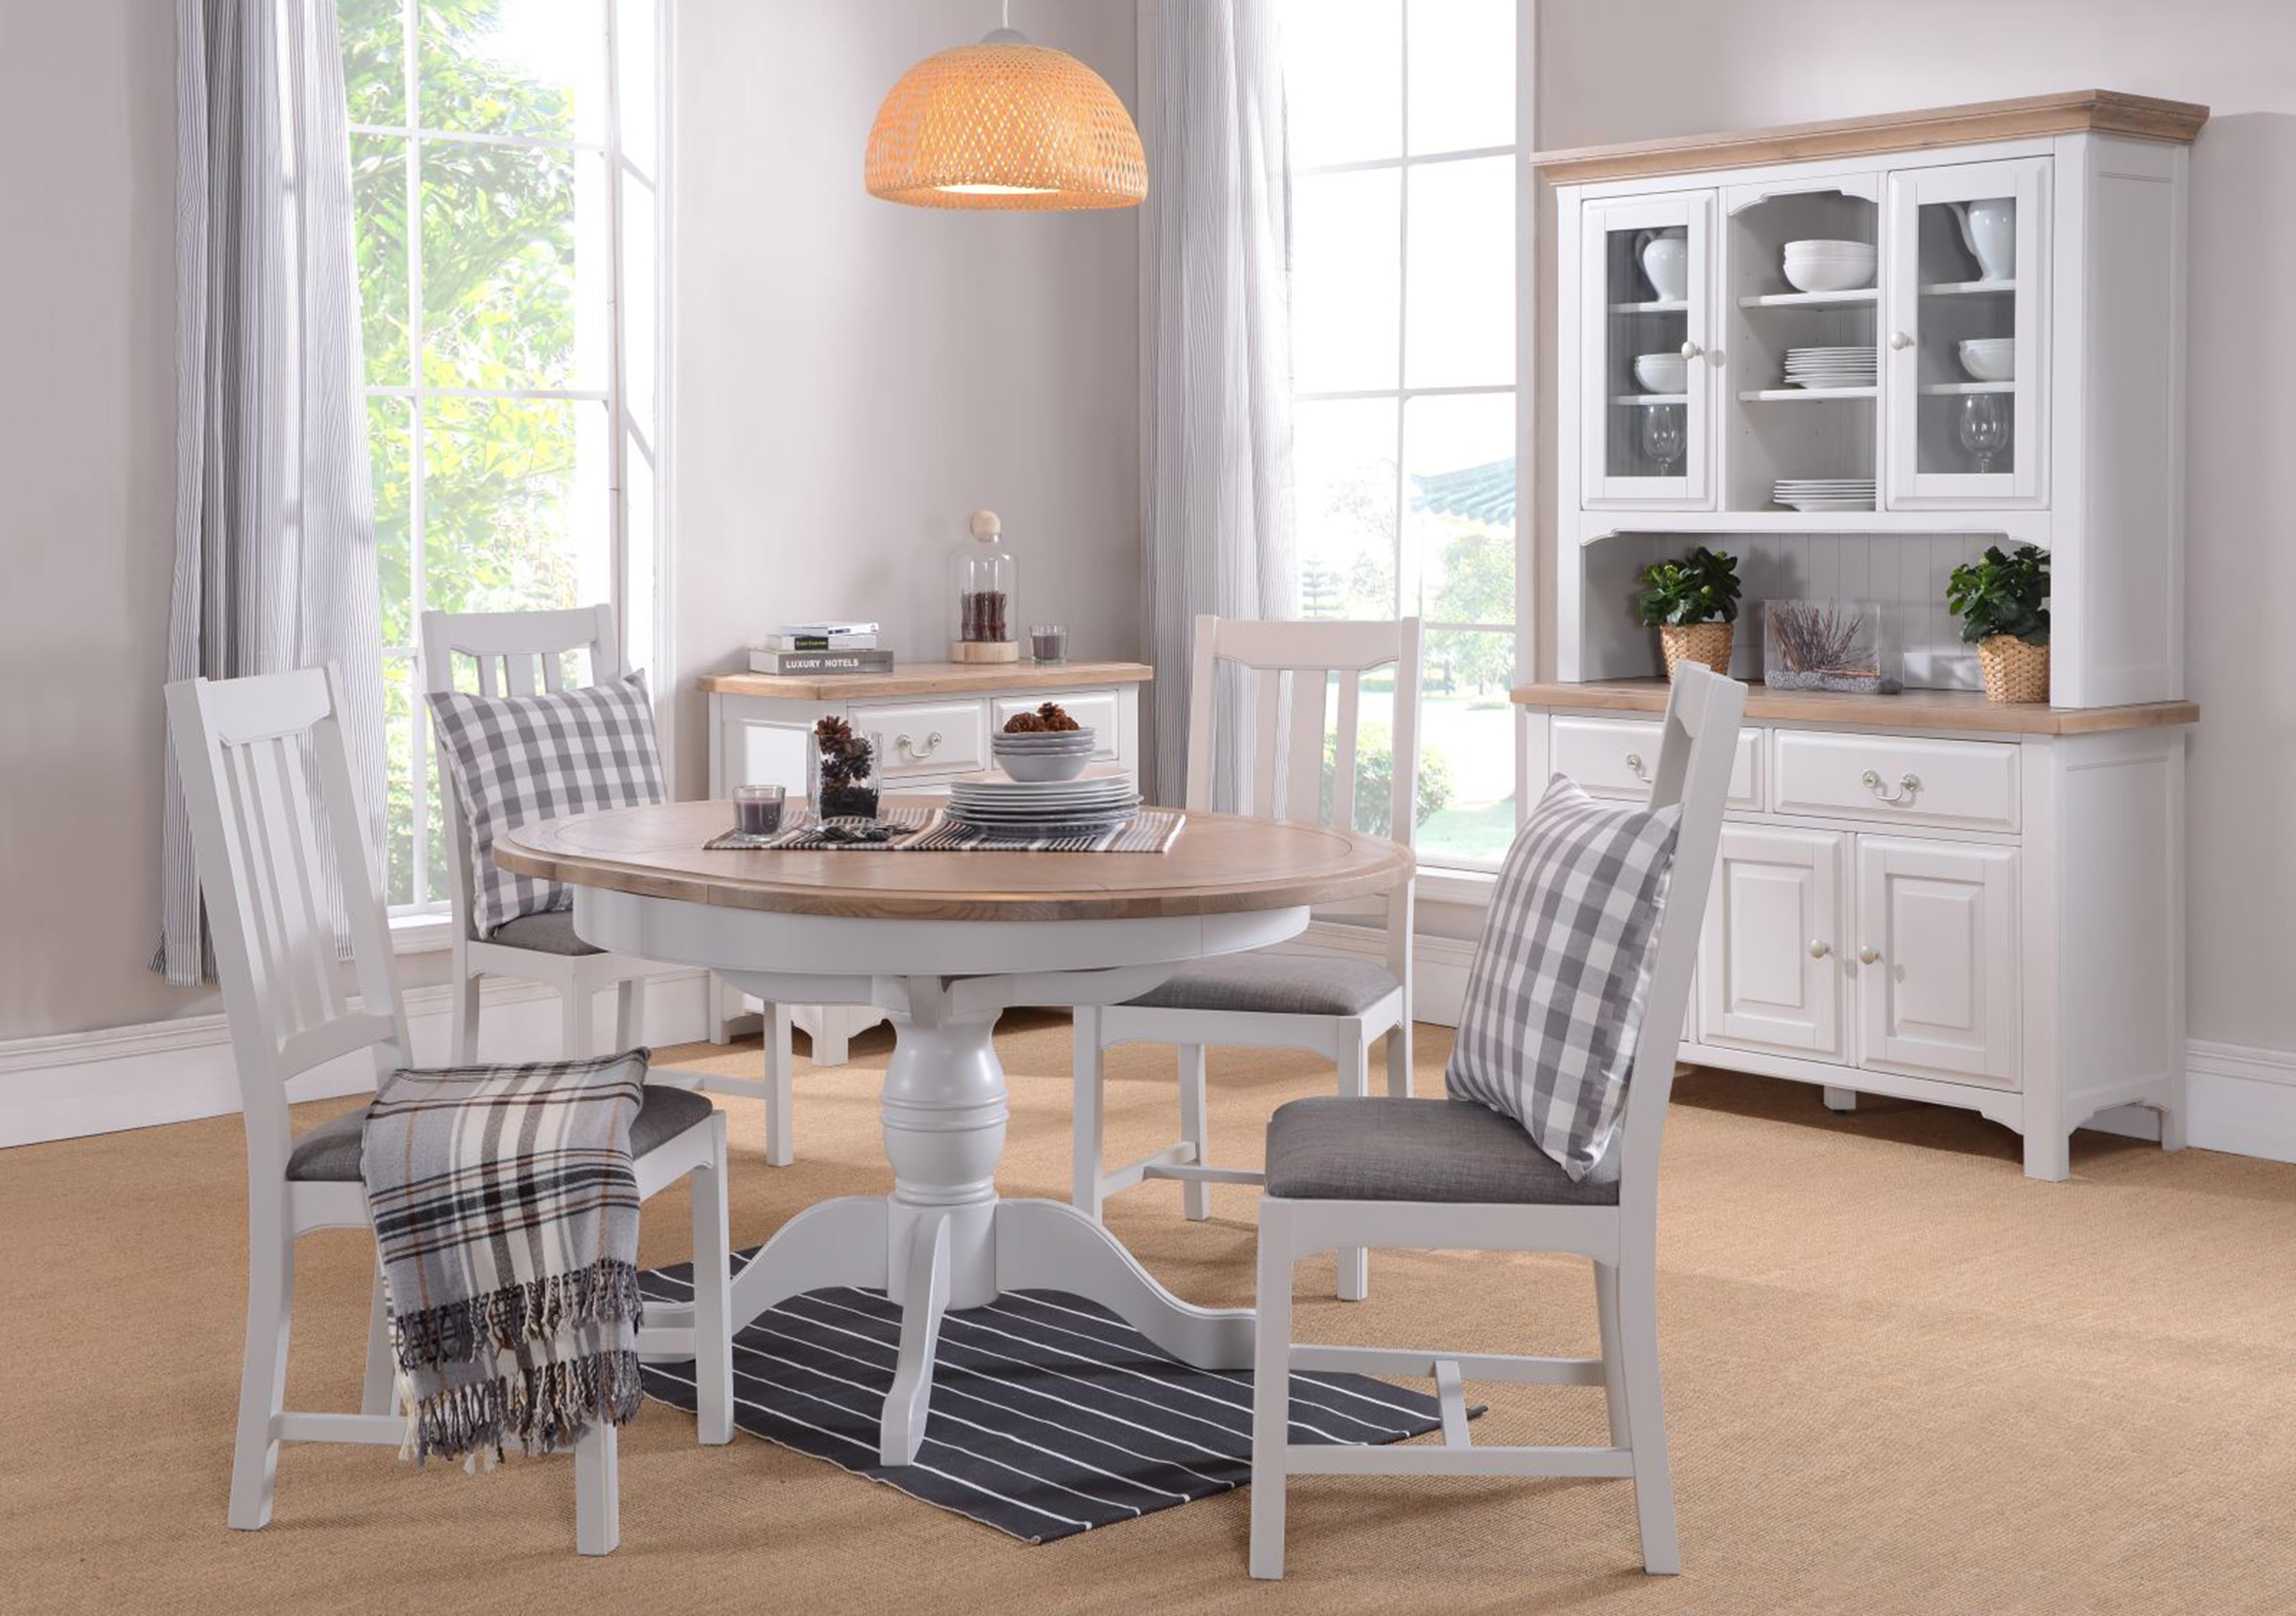 Cobham Round Table and 4 Chairs Furnitureland Furniture Village